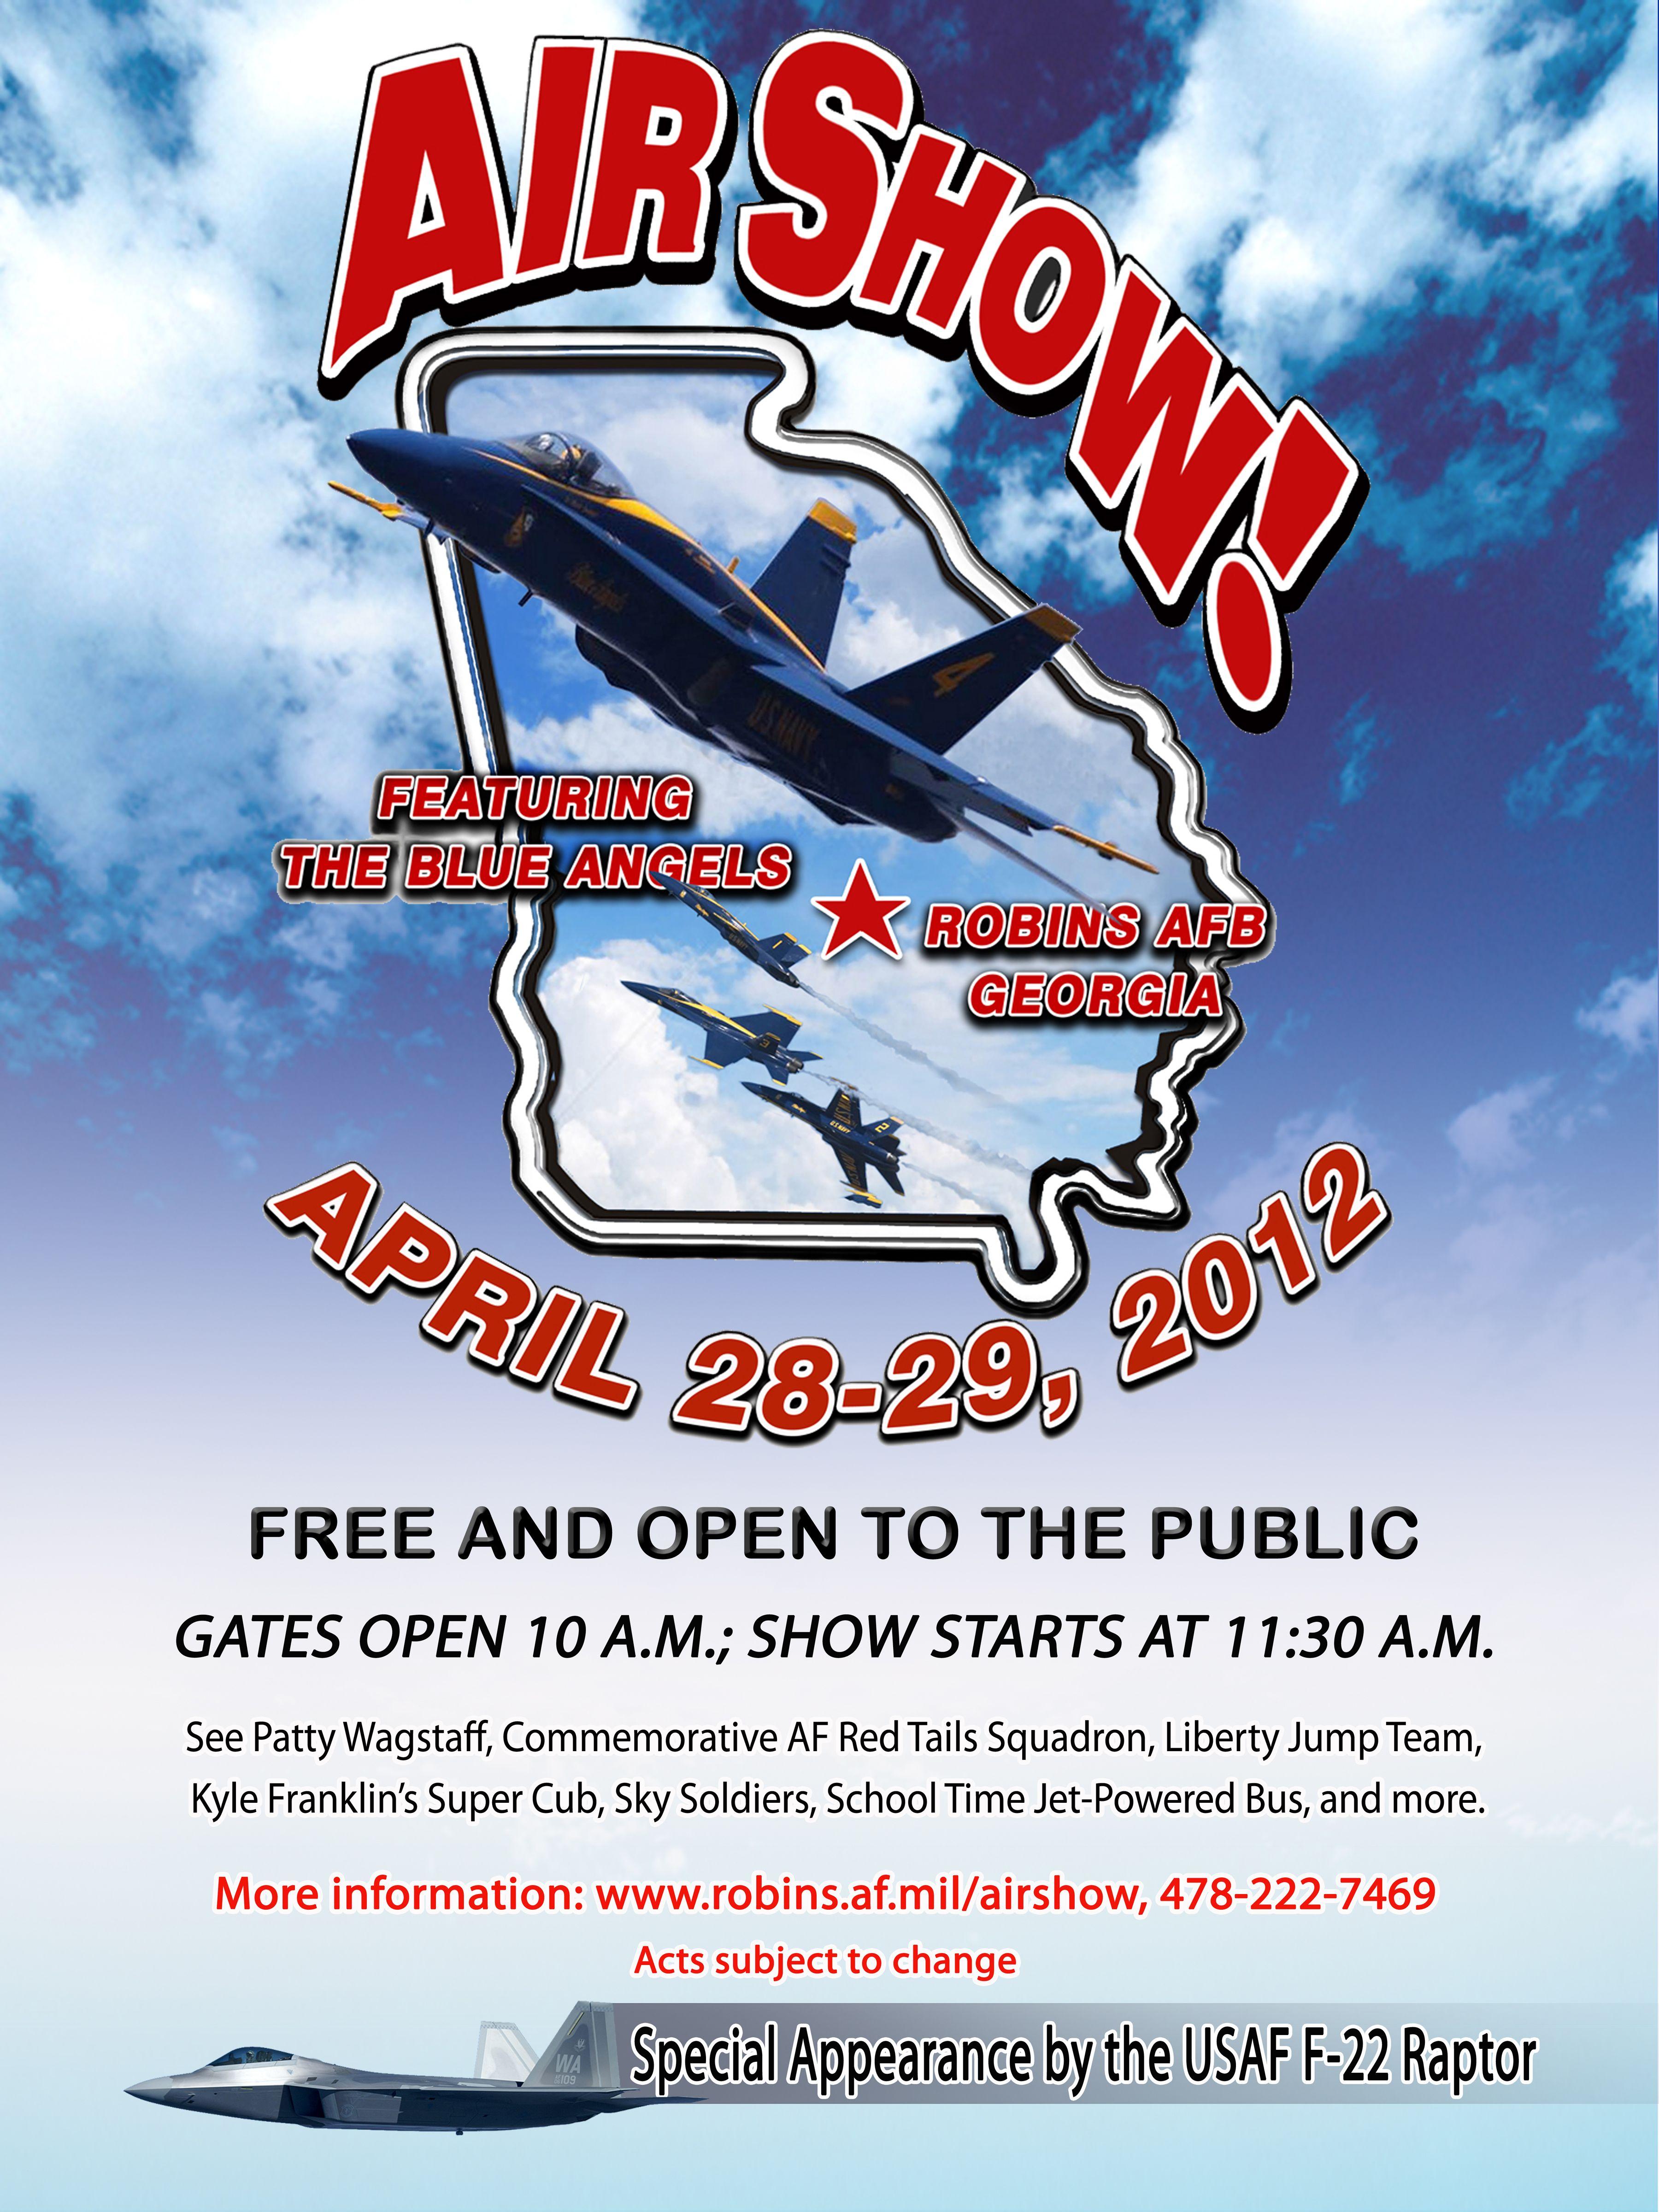 go enjoy The Robins Air Show 2012, featuring the Blue